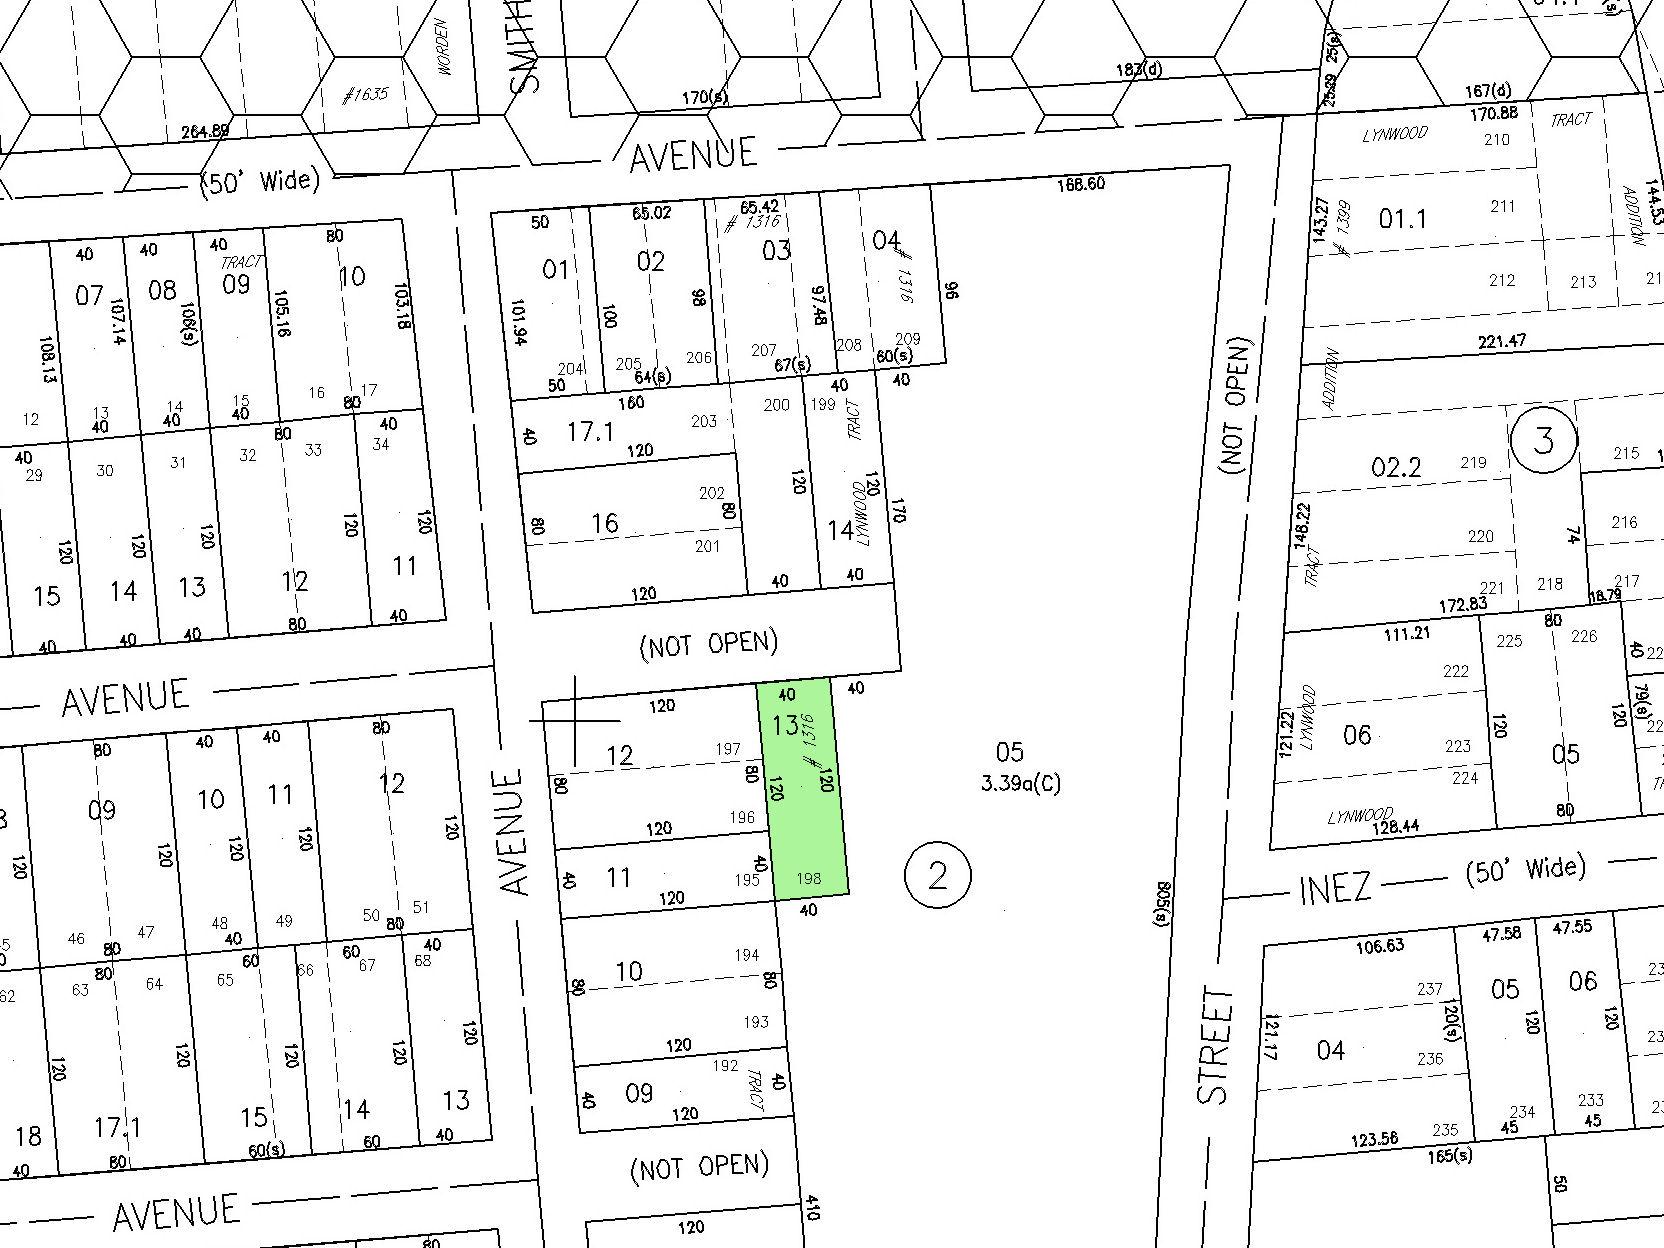 Brzostek Real Estate Auction Co Inc Onondaga County